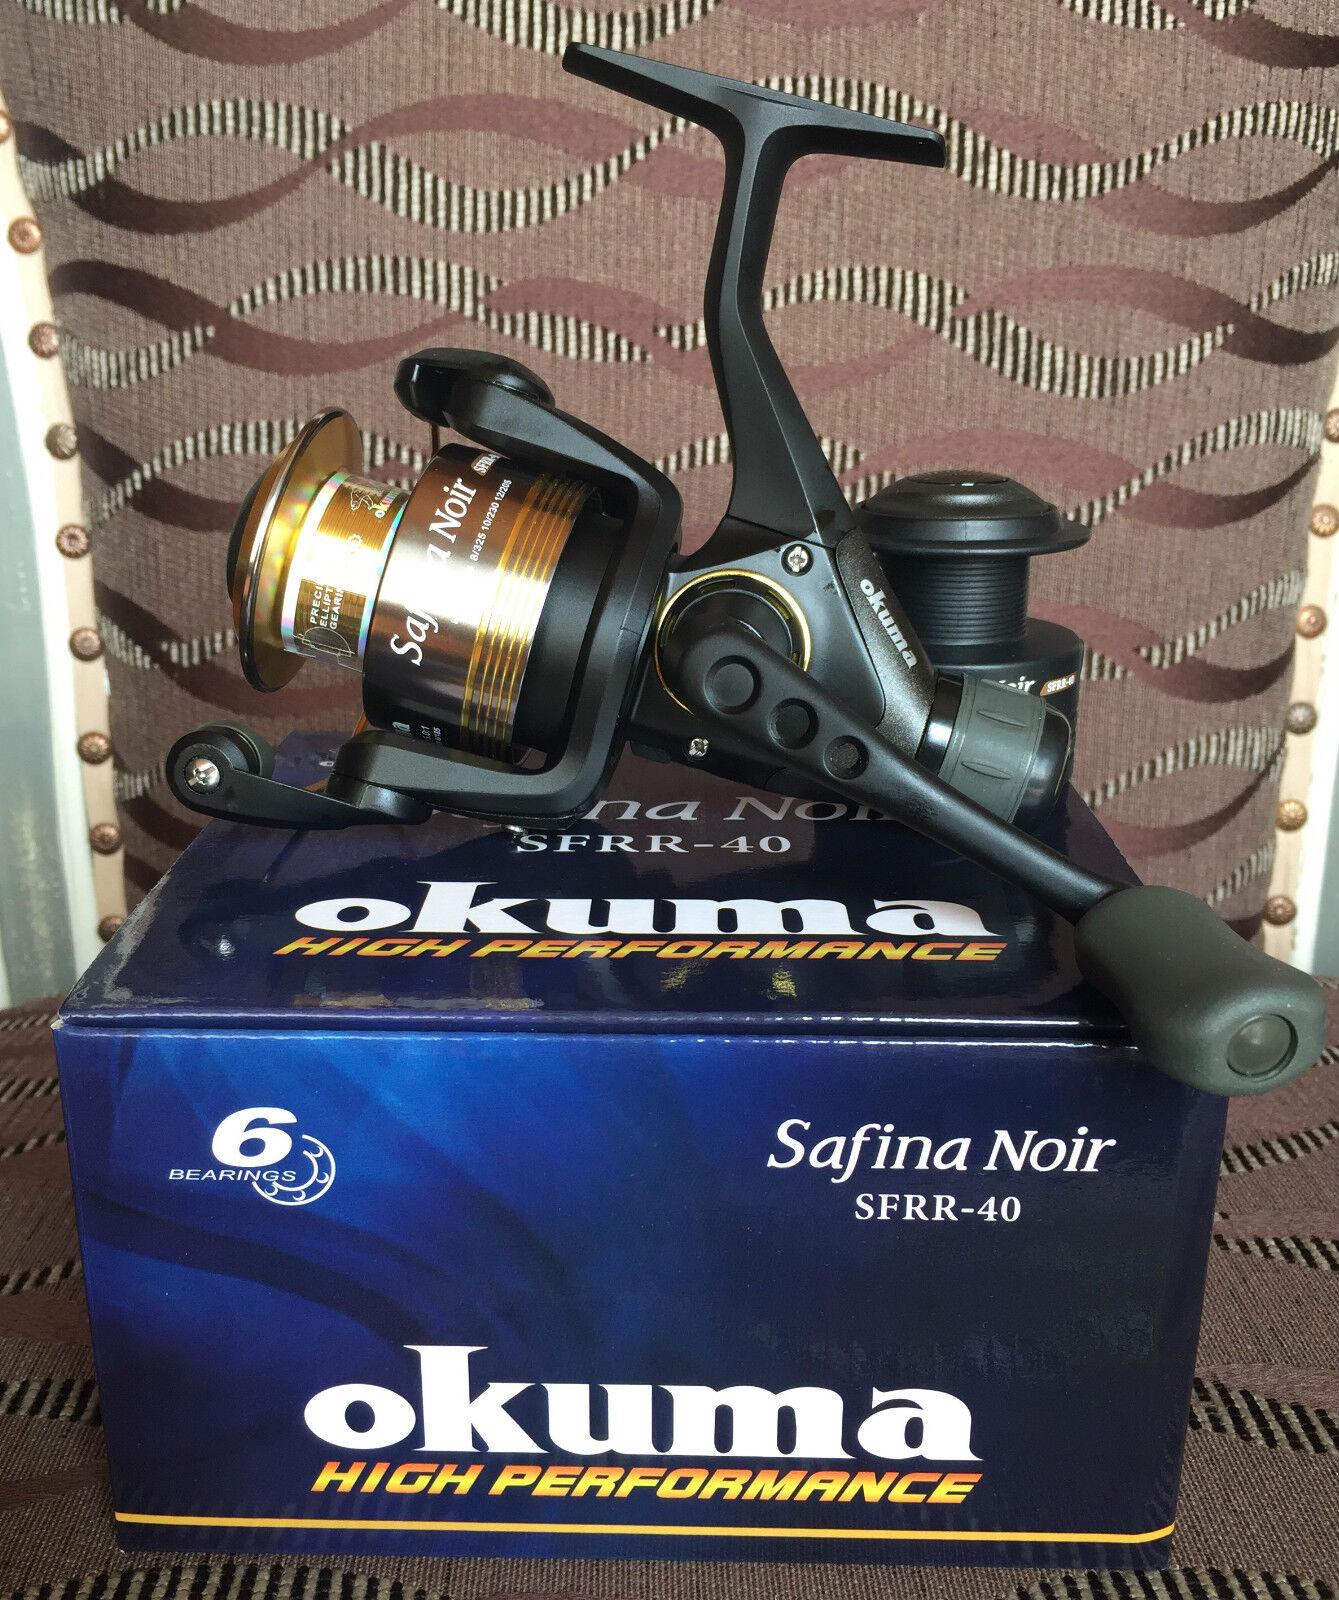 OKUMA Safina nero SFRR - 40 RD spinnrolle